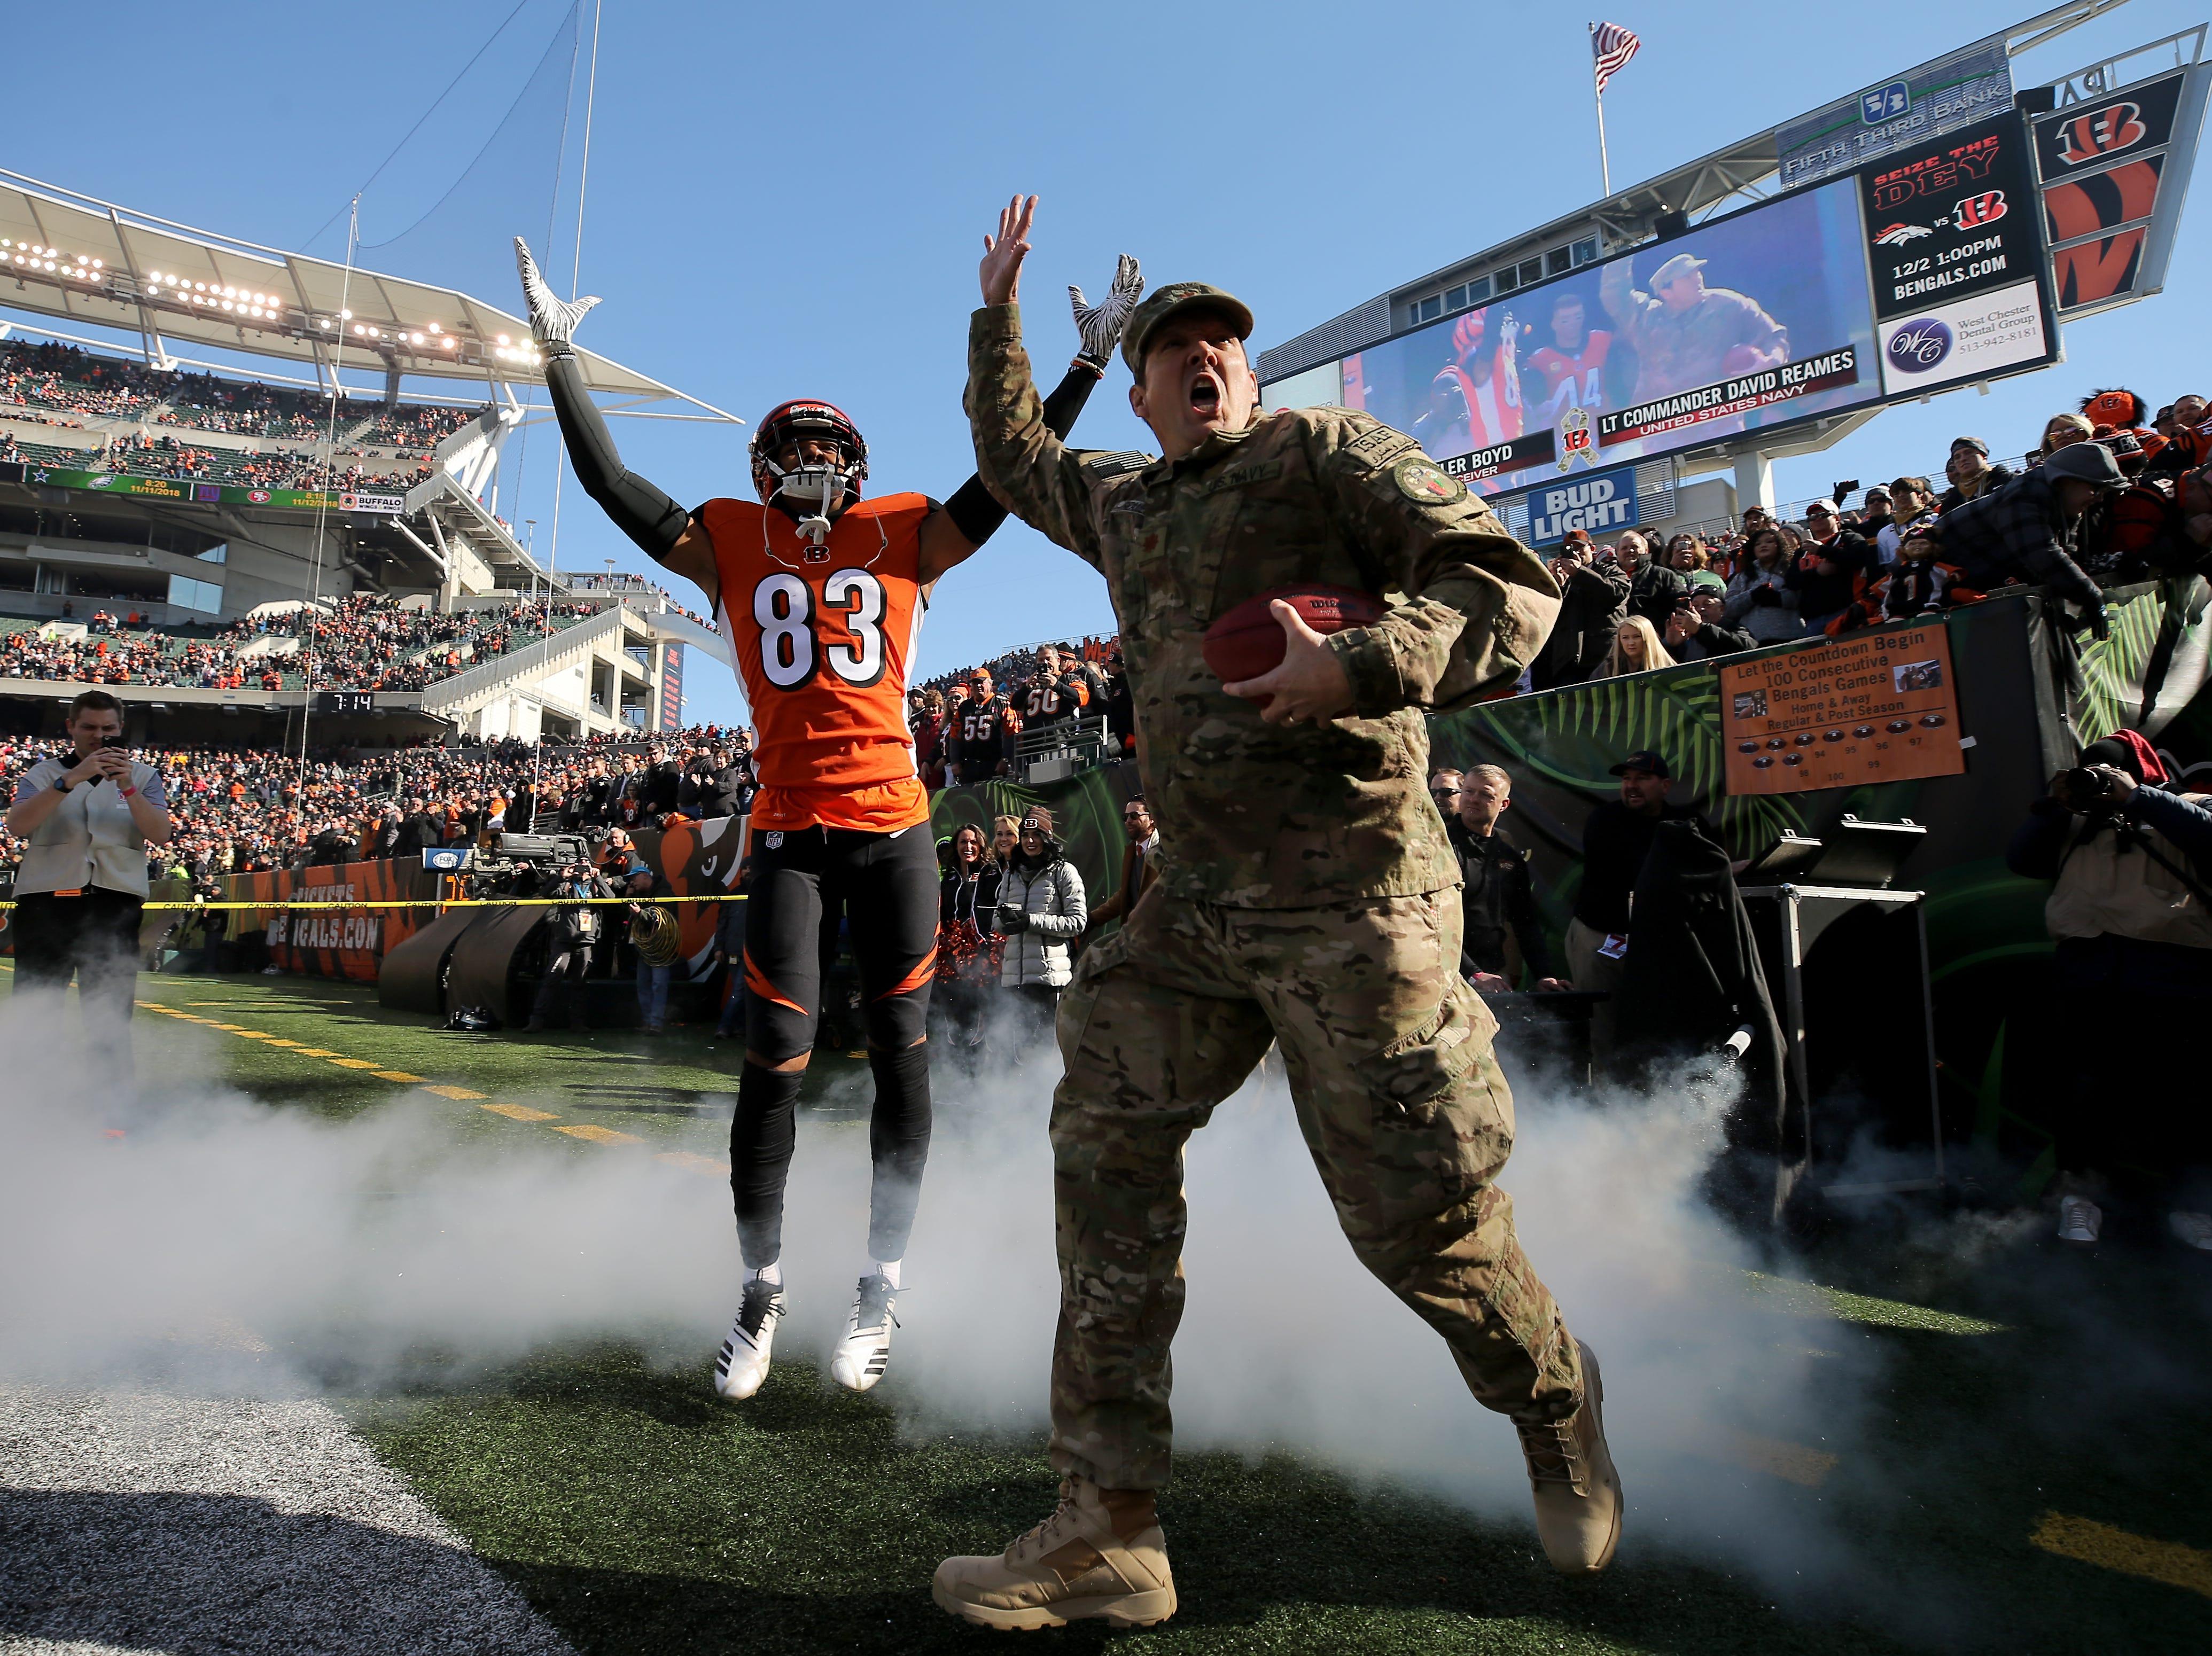 Navy Lt. Commander David Reames, right, is introduced with Cincinnati Bengals wide receiver Tyler Boyd (83) before the Week 10 NFL game between the New Orleans Saints and the Cincinnati Bengals, Sunday, Nov. 11, 2018, at Paul Brown Stadium in Cincinnati.